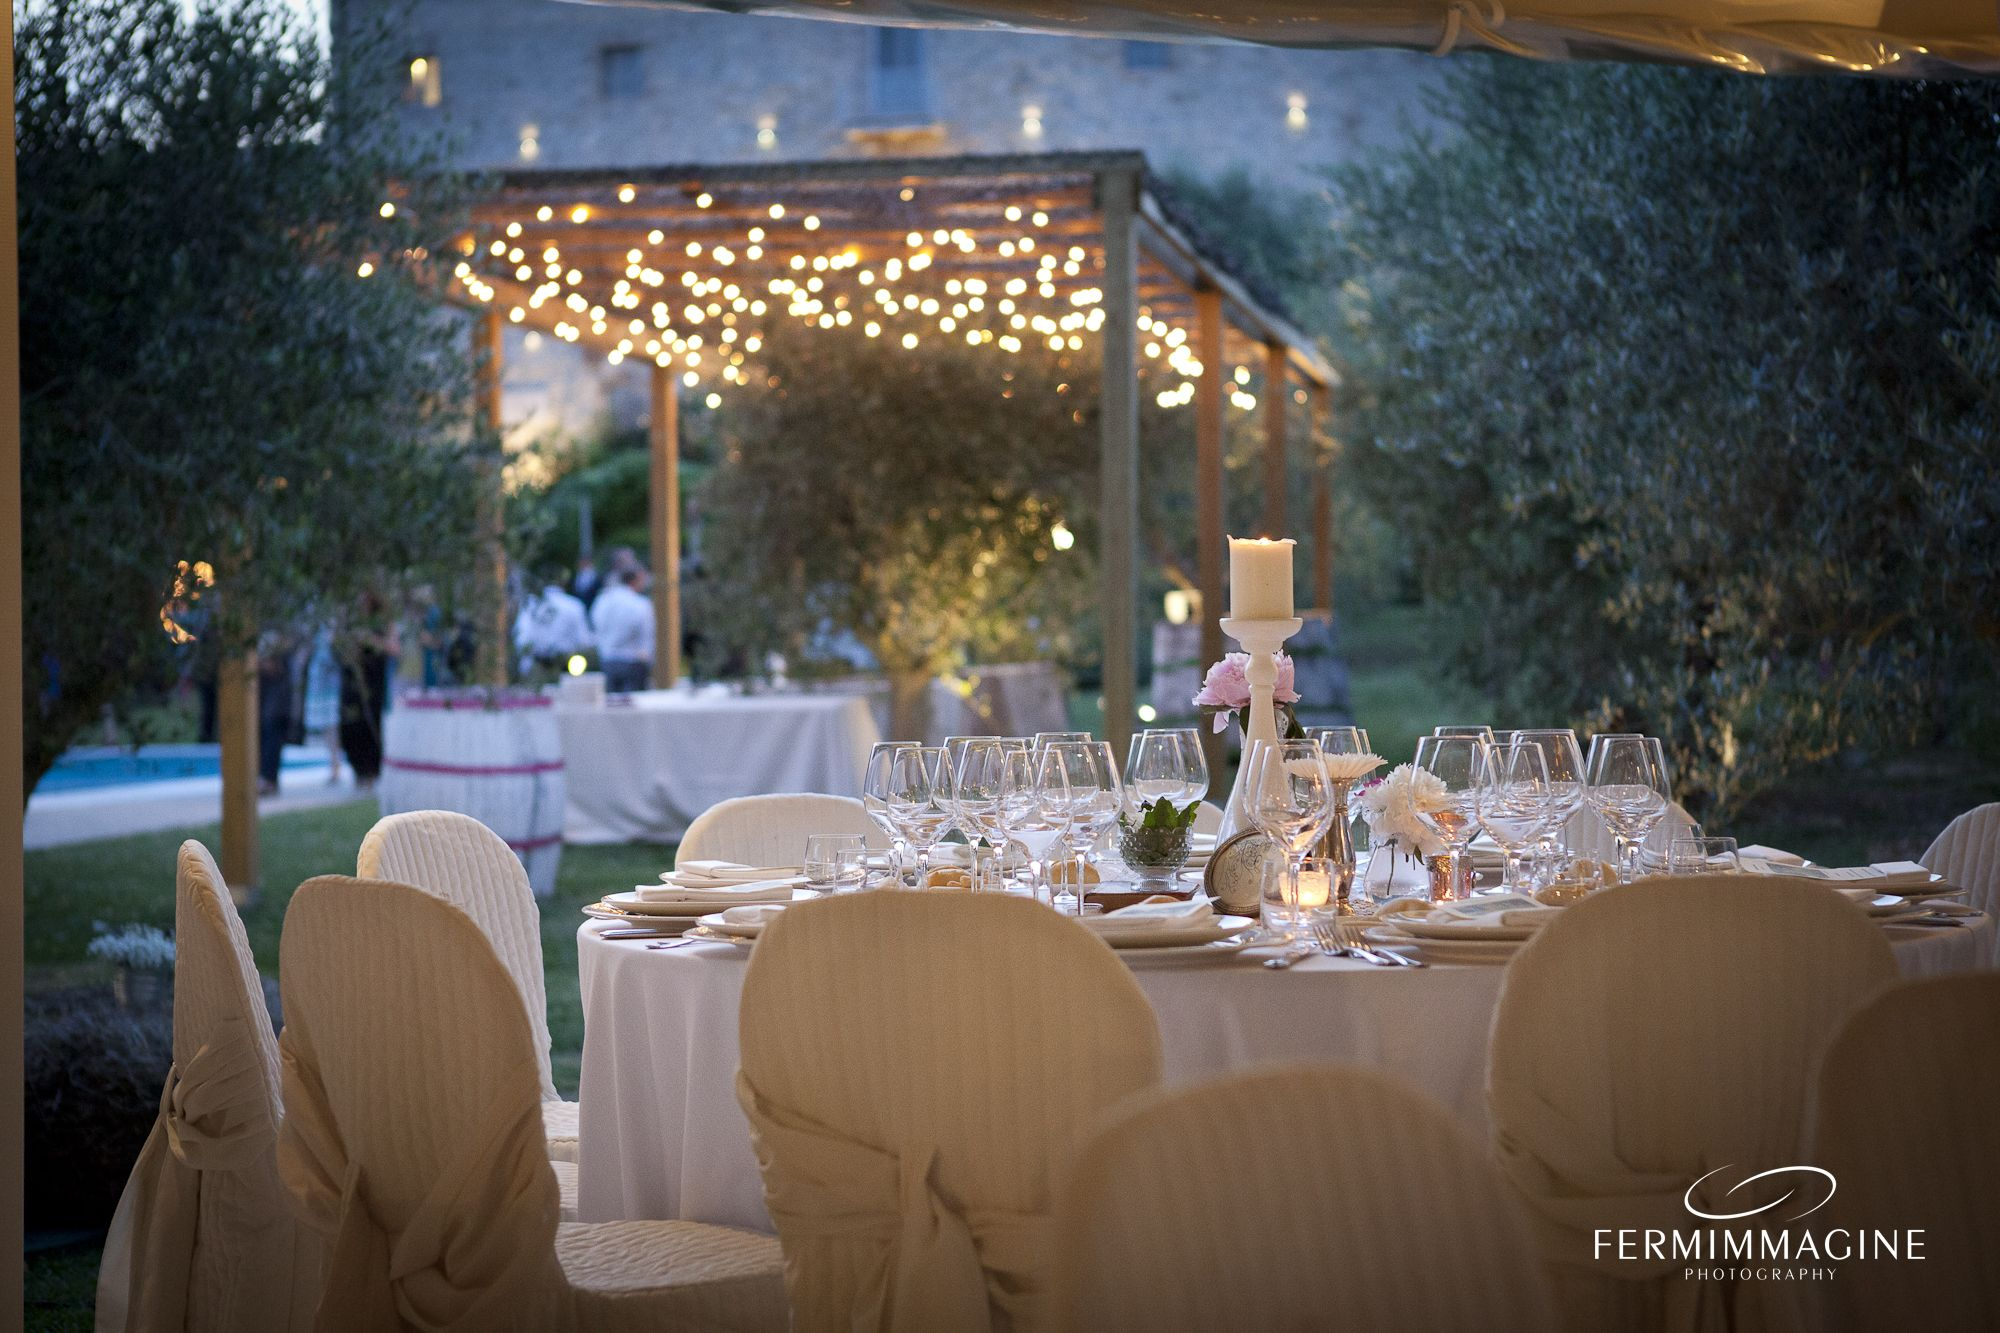 #CastellodiMontignano #Wedding #Reception #Stringlights #Country #Beatiful #View #Flowercentrepiece